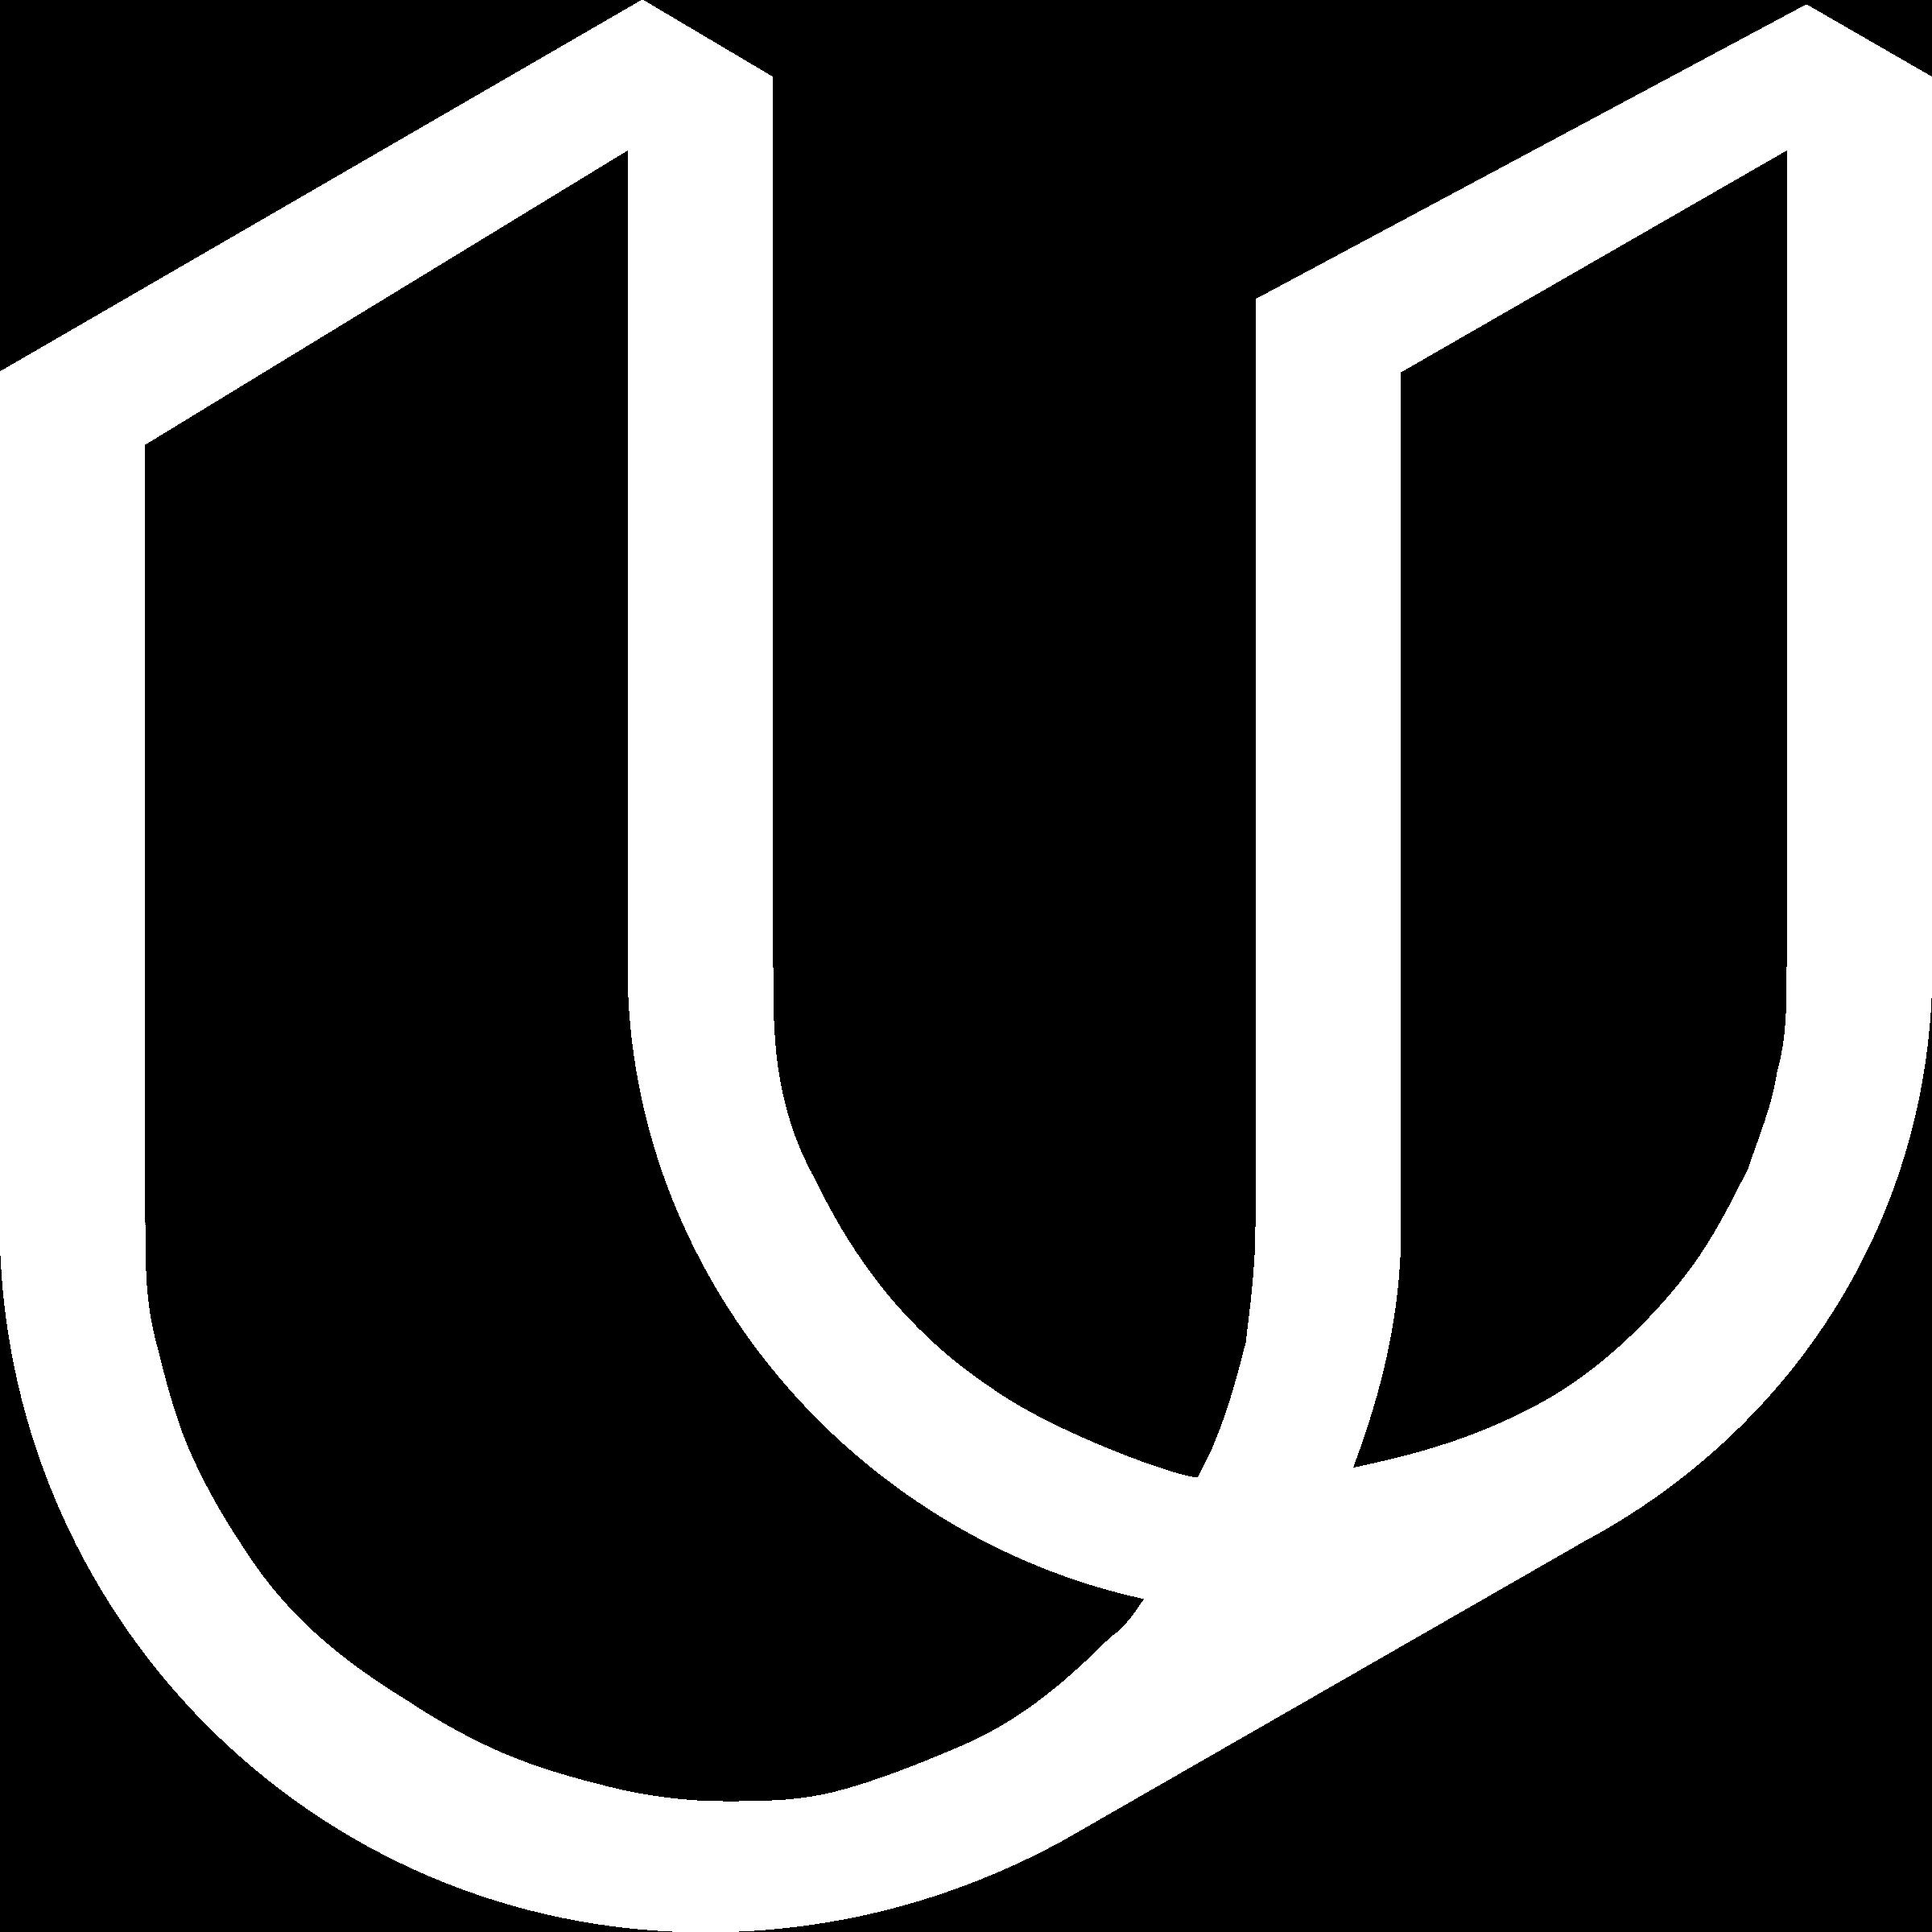 Udacity Logo PNG Transparent & SVG Vector - Freebie Supply  Udacity Logo PN...